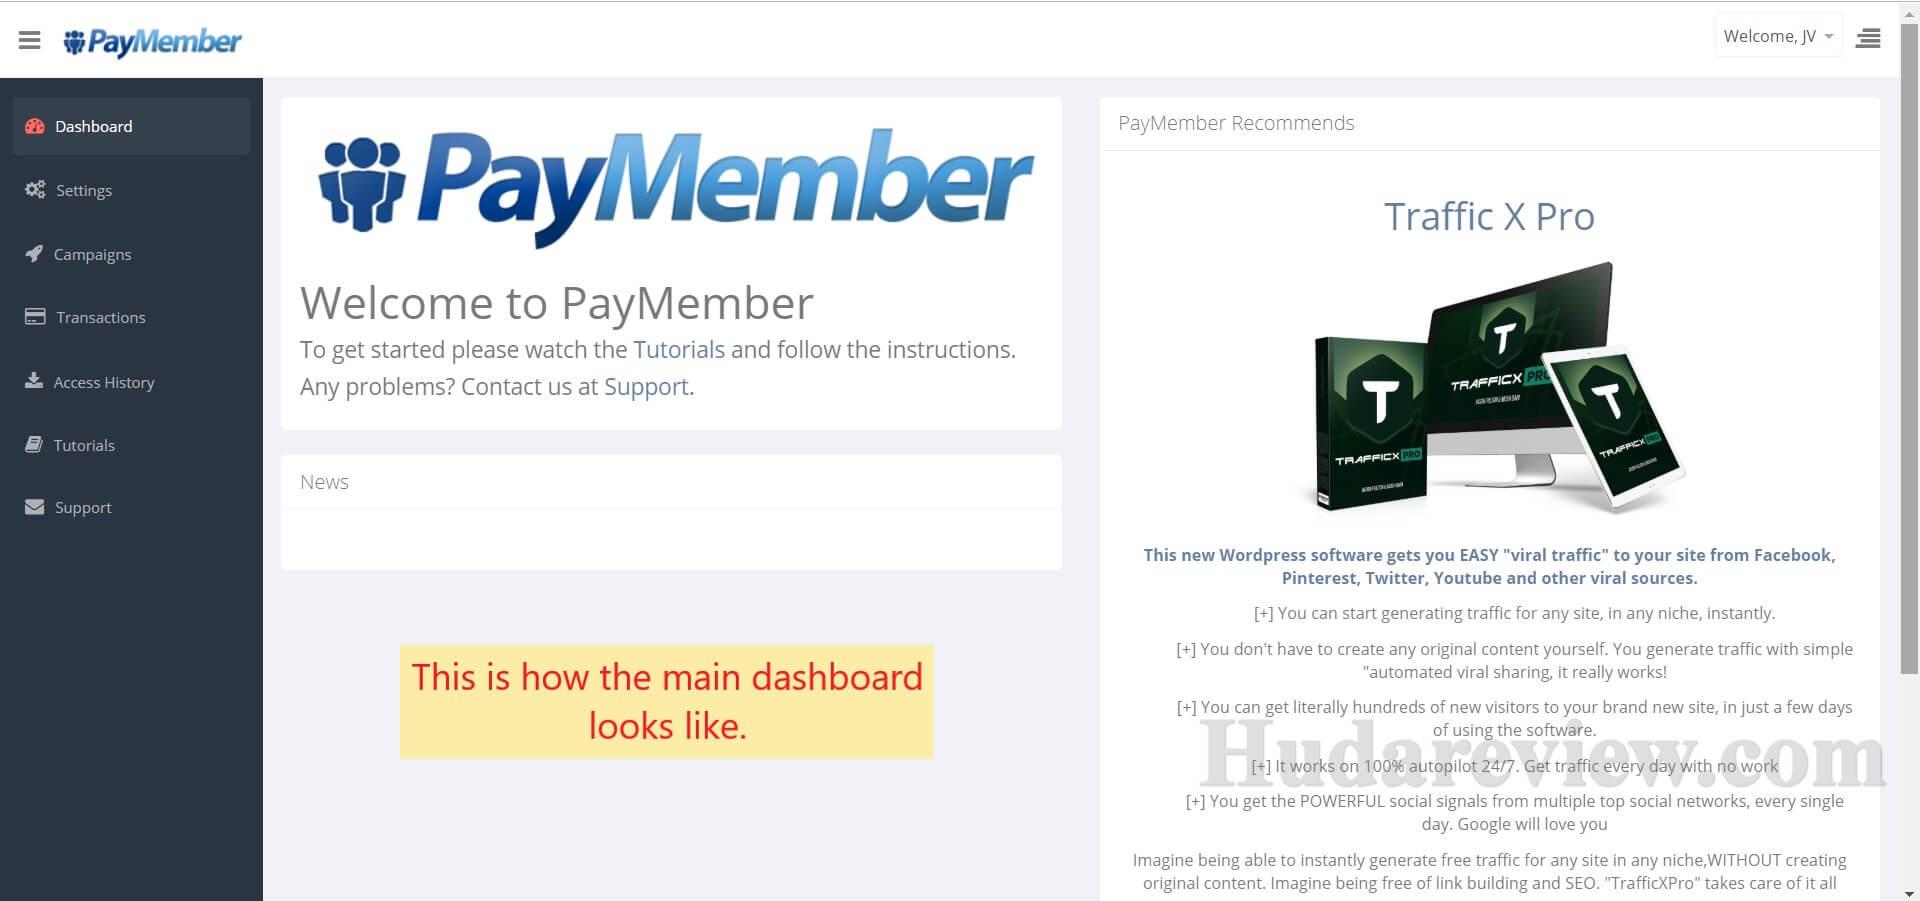 PayMember-2-Step-1-2